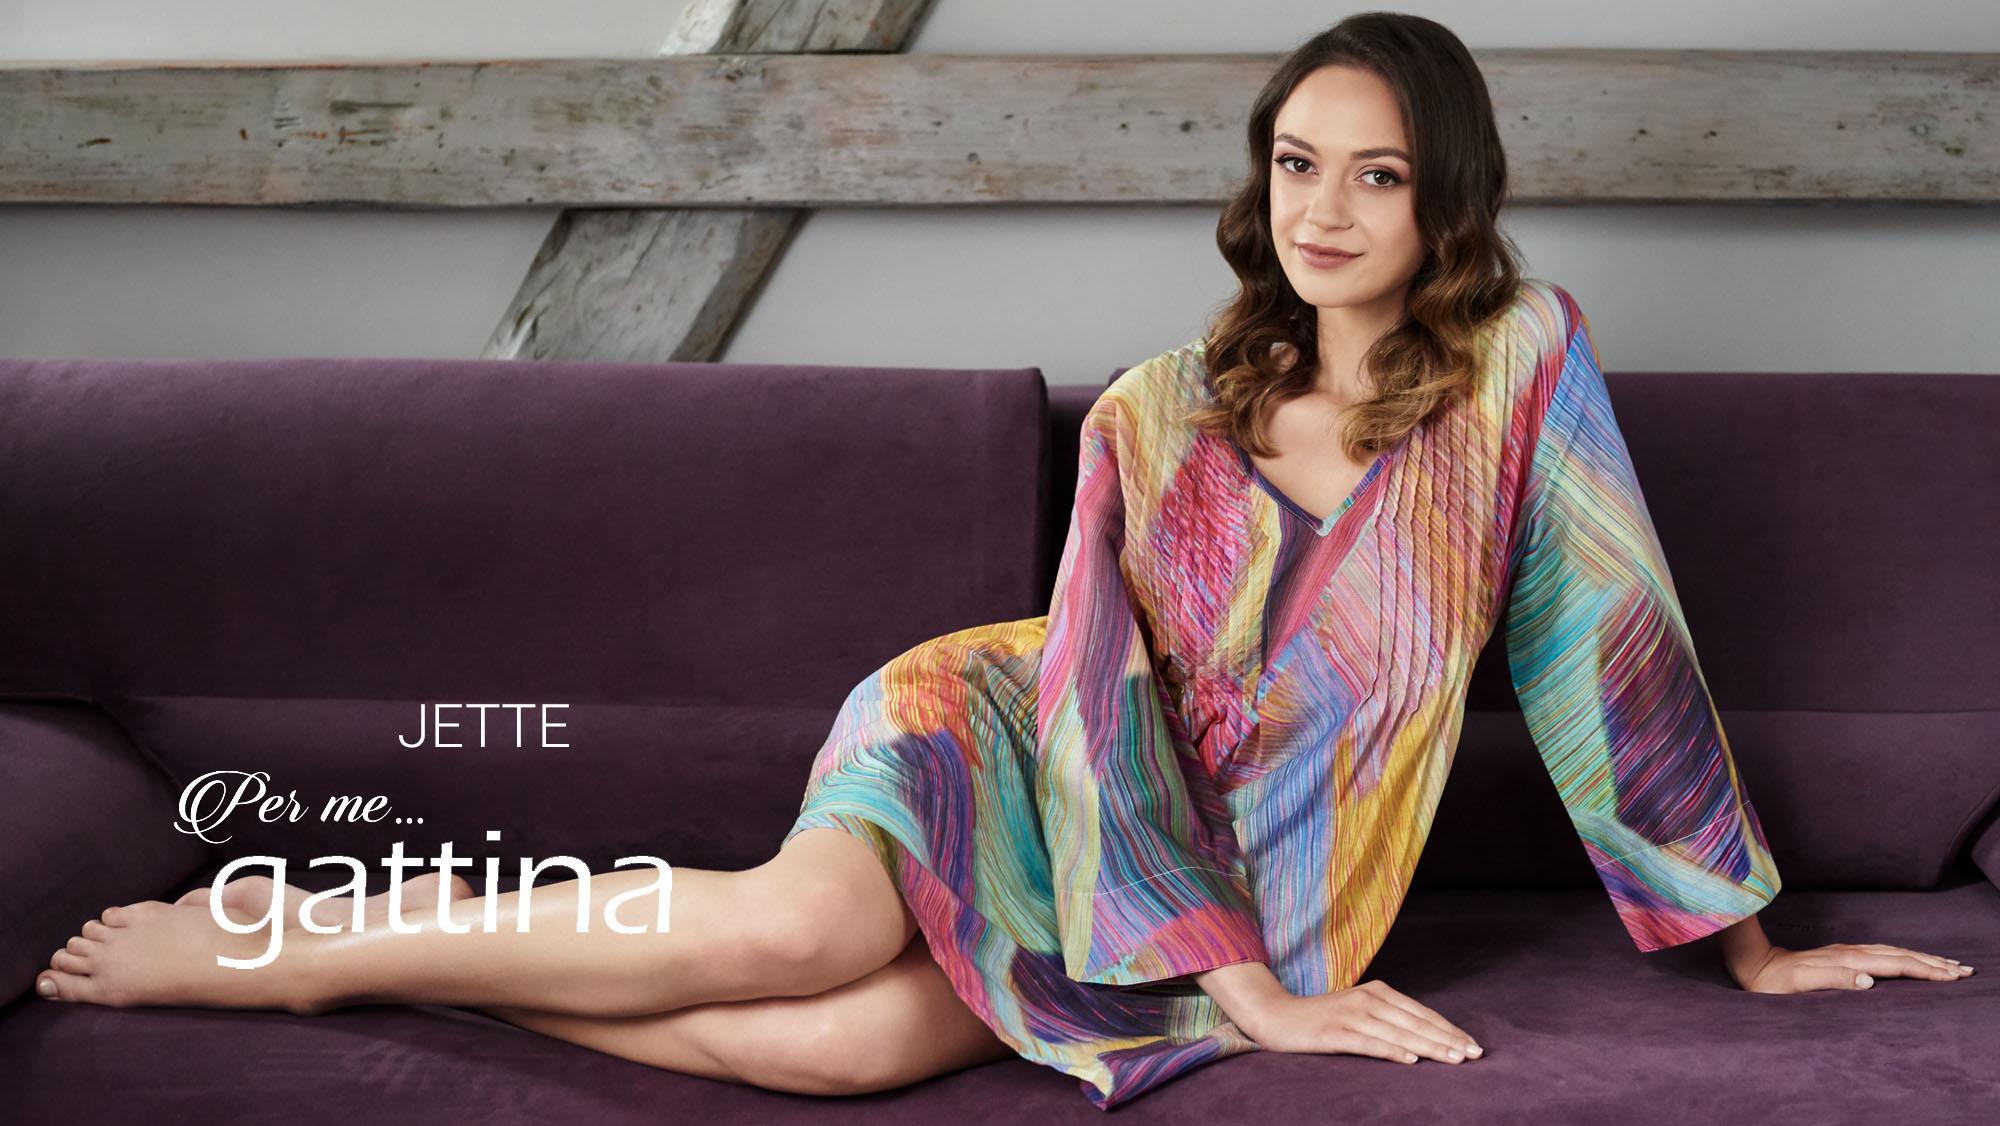 Gattina Jette